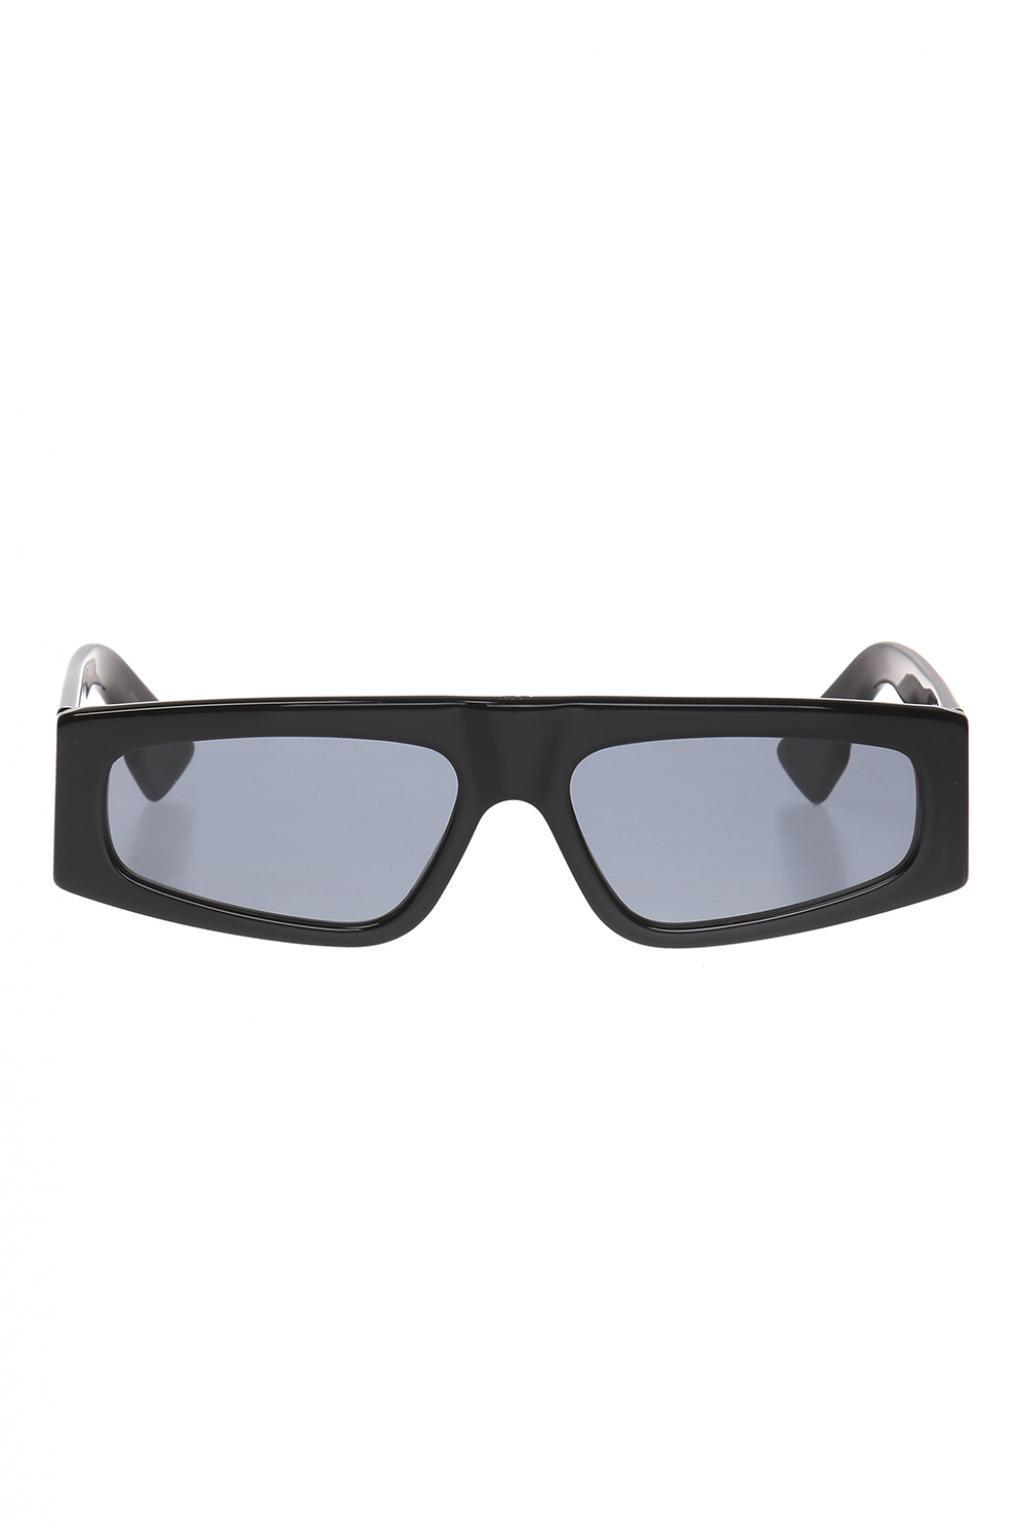 b794d1d871 Dior  power  Sunglasses in Black for Men - Lyst